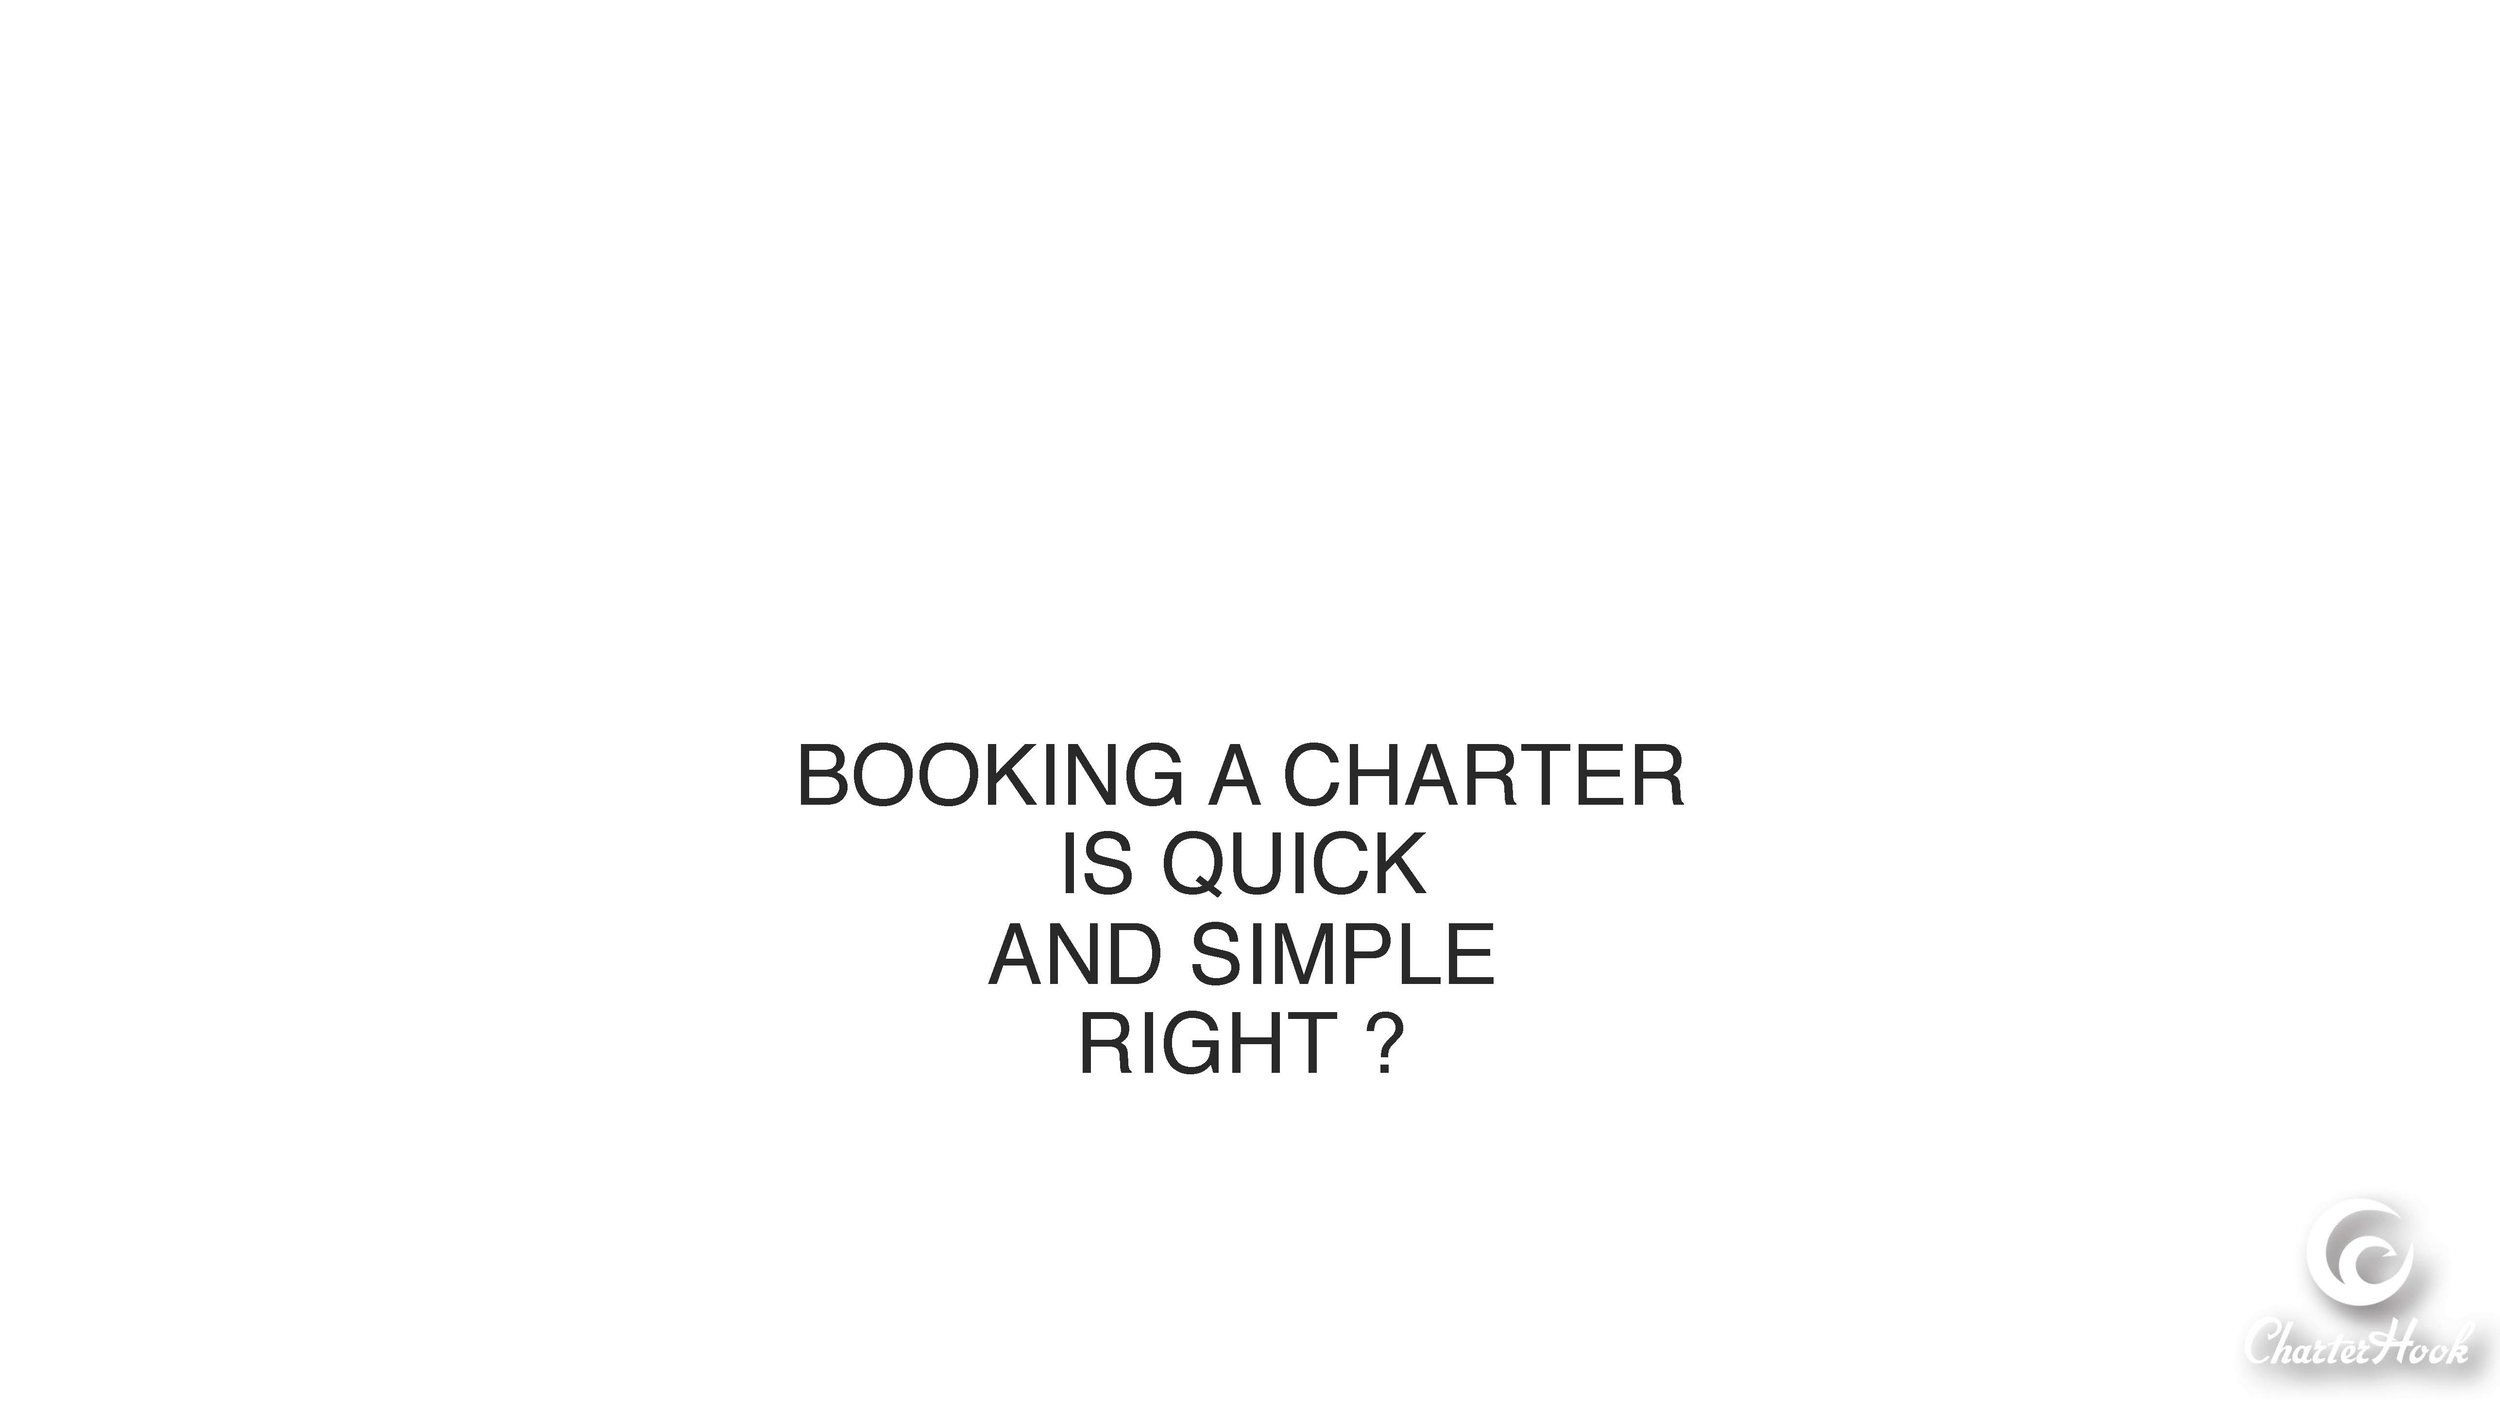 Charterhook_Demo Day Pitch Deck_08162018_Page_03.jpg